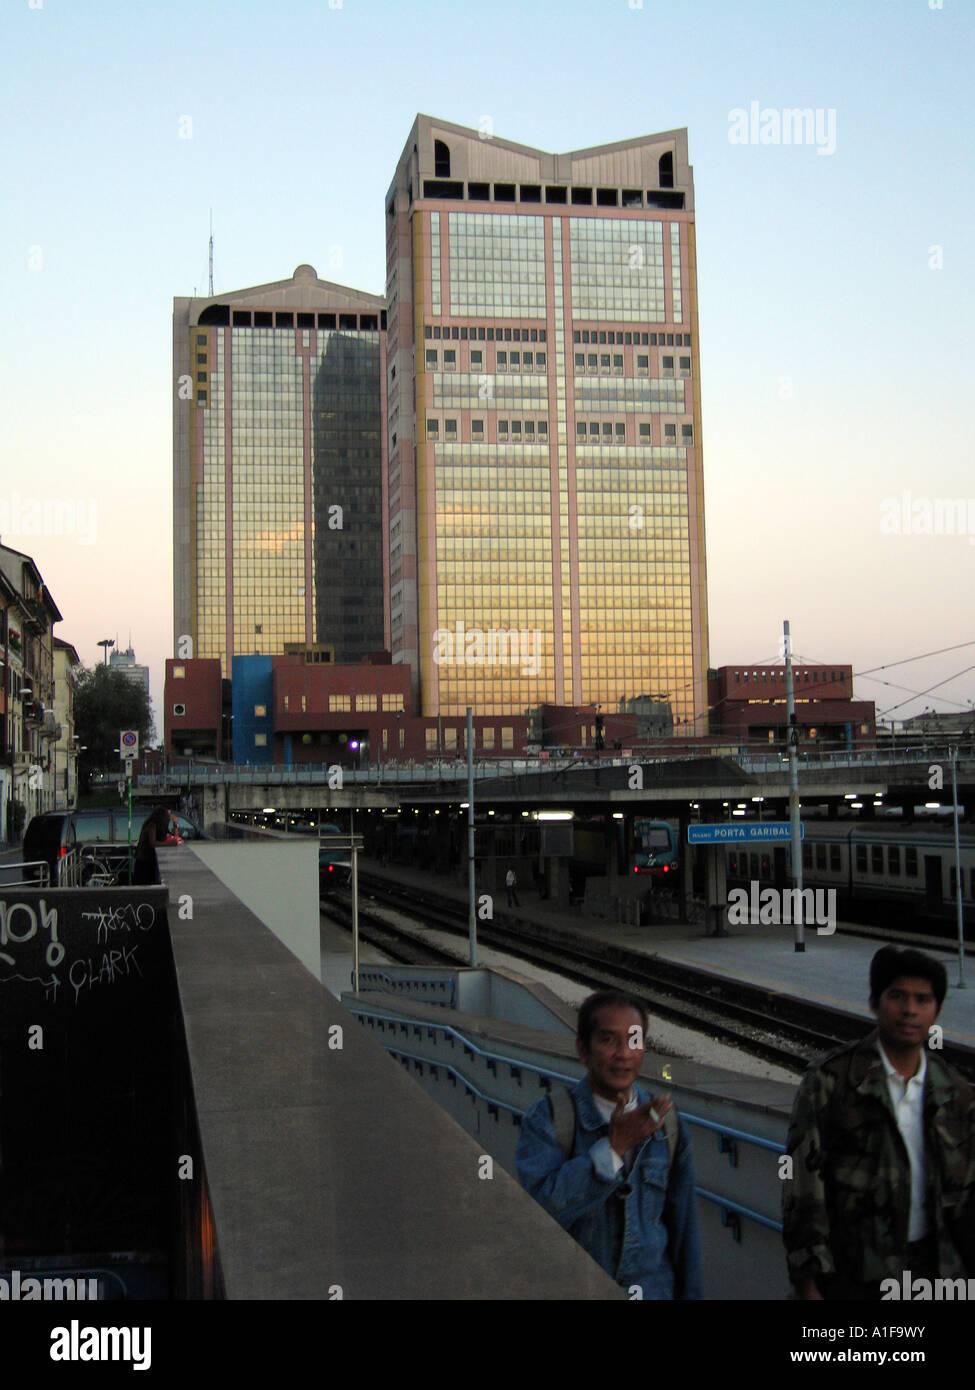 Passante stock photos passante stock images alamy - Passante ferroviario porta garibaldi ...